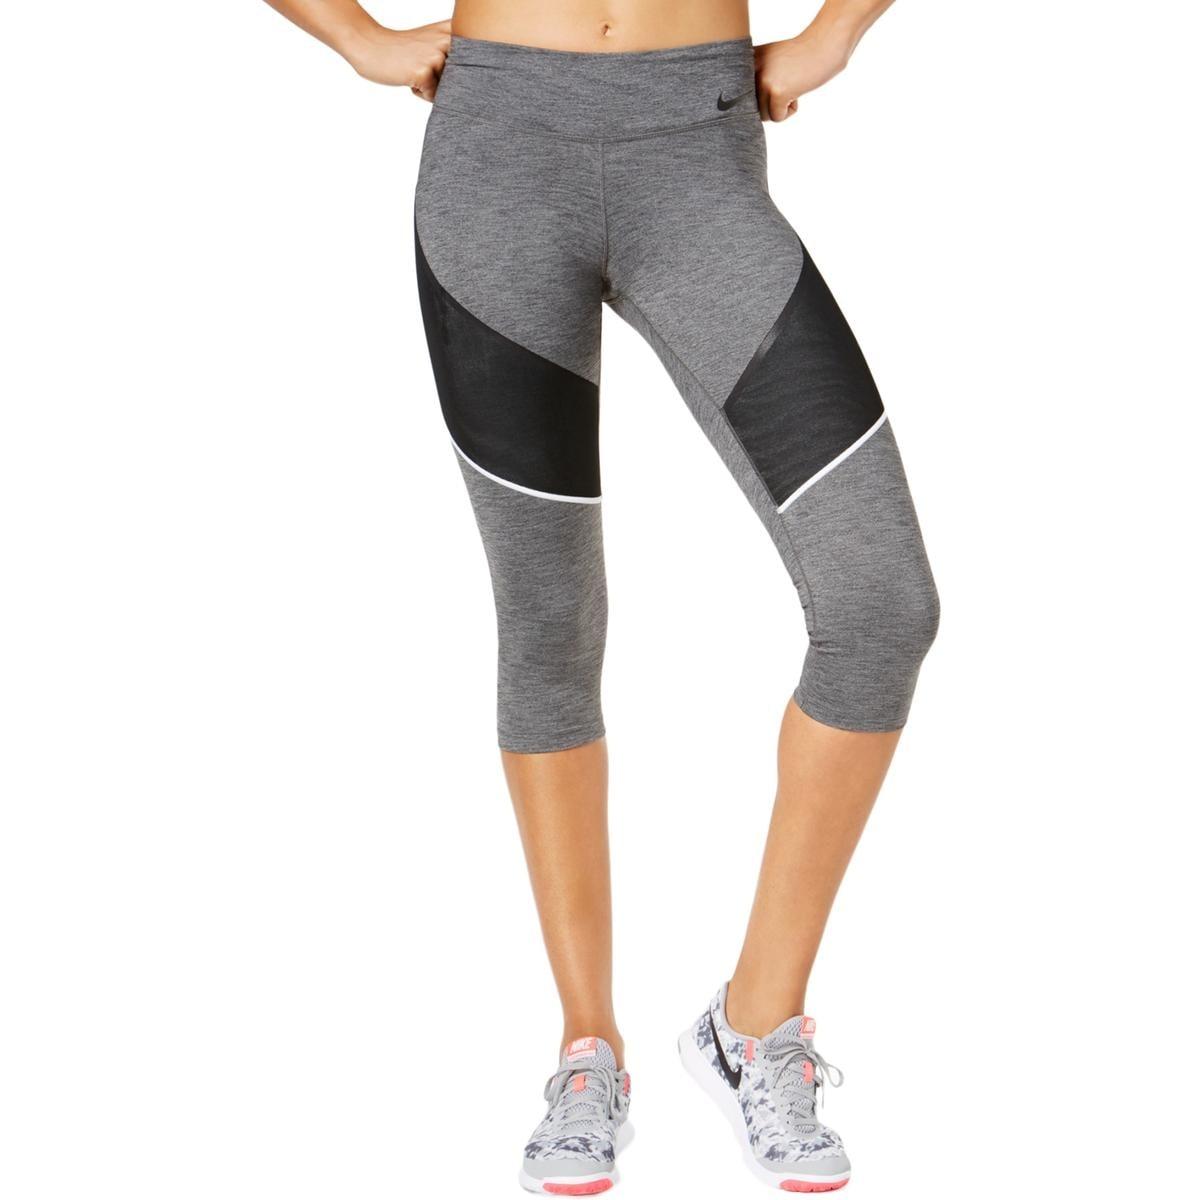 ec4e42aeded43 Shop Nike Womens Capri Pants Training Fitness - S - Free Shipping On ...